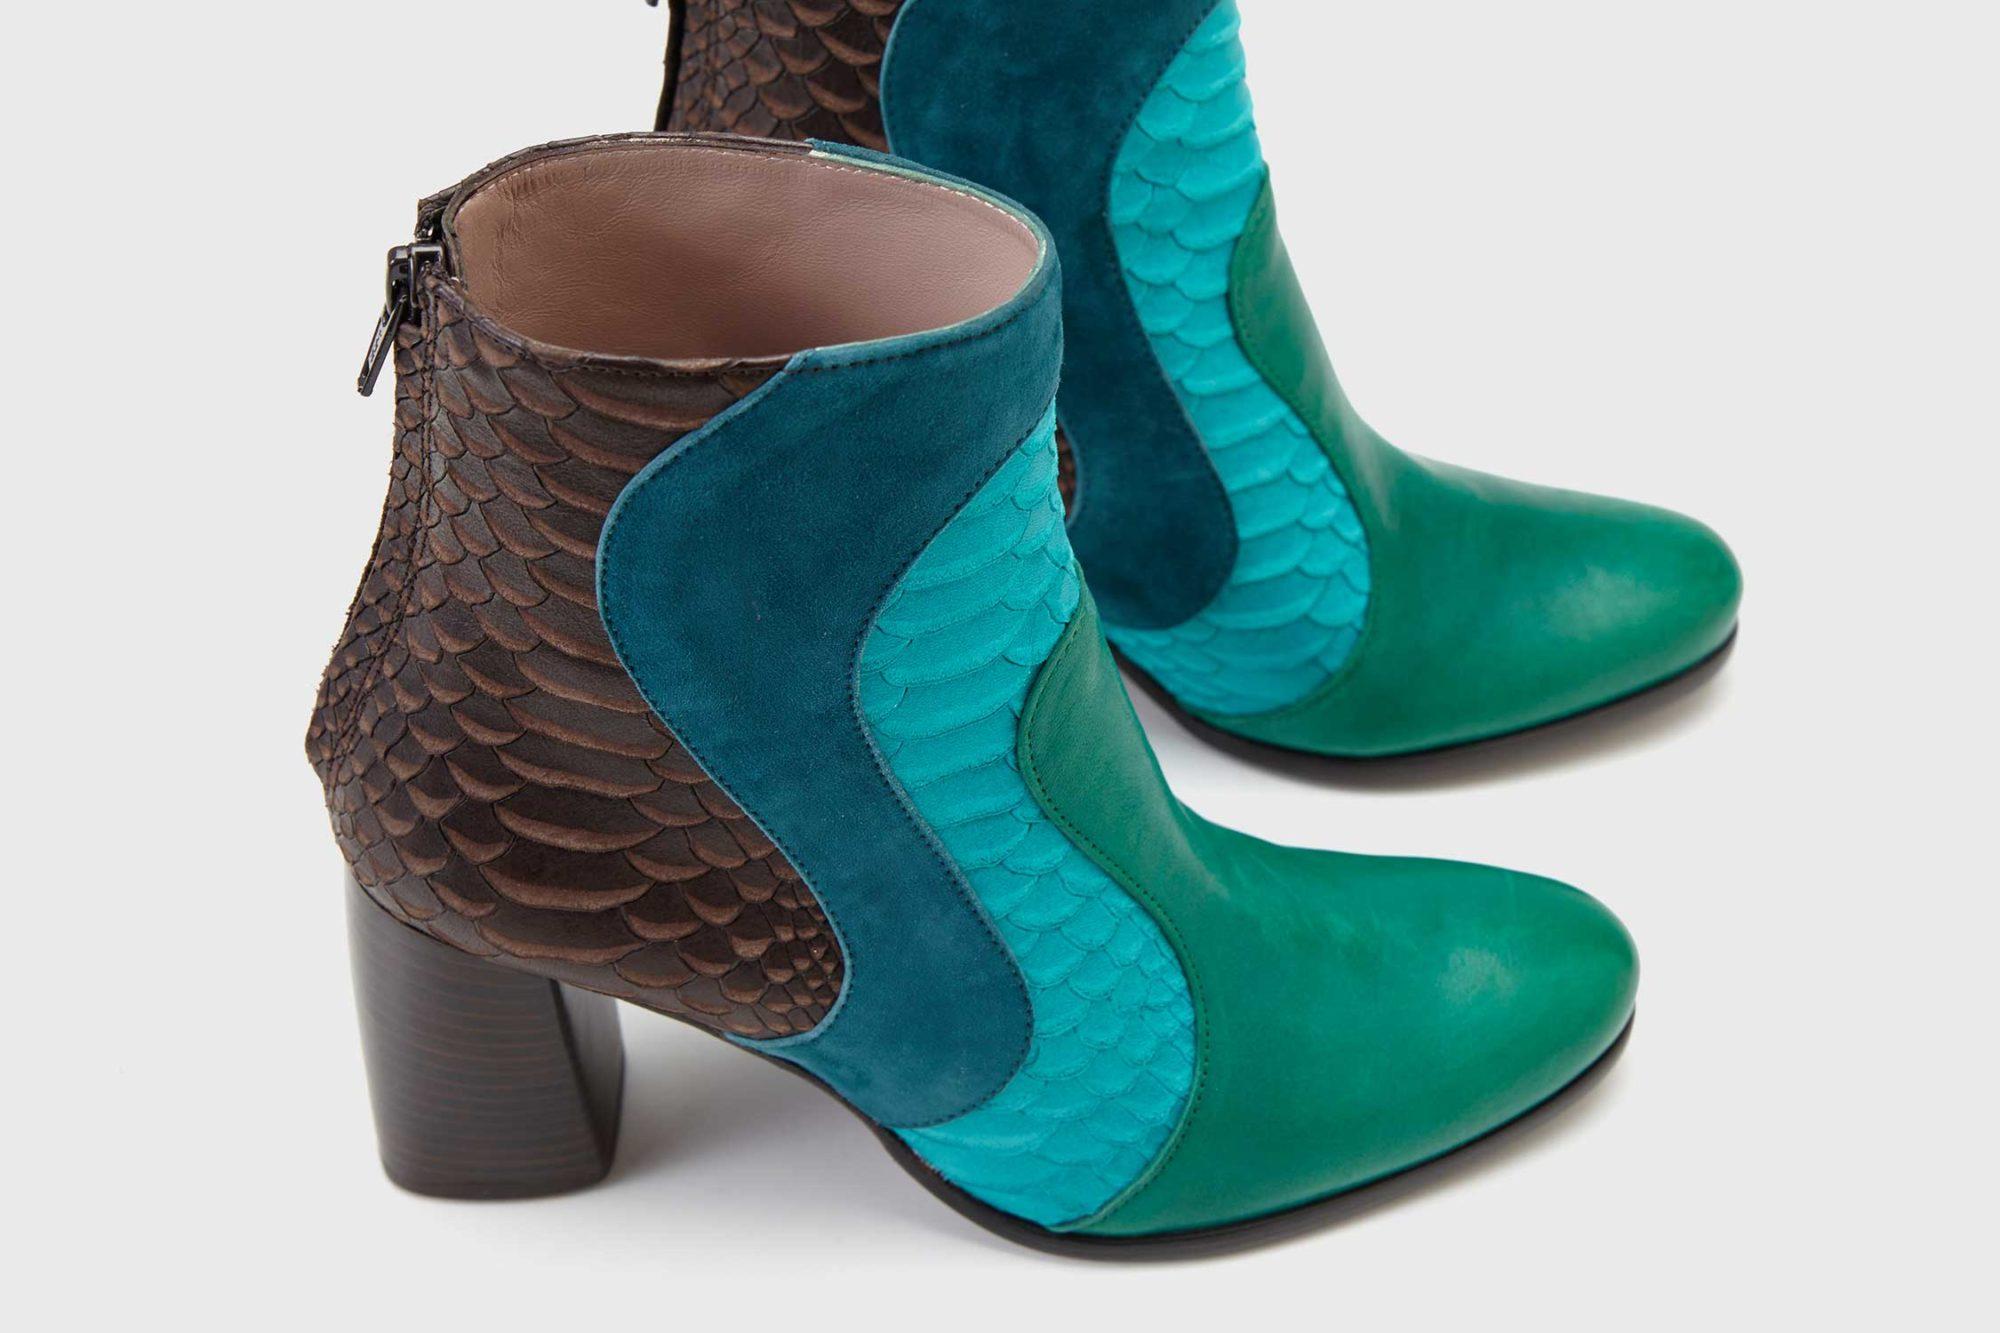 Dorotea botín de tacón alto Joy multicolor fw18 detalle